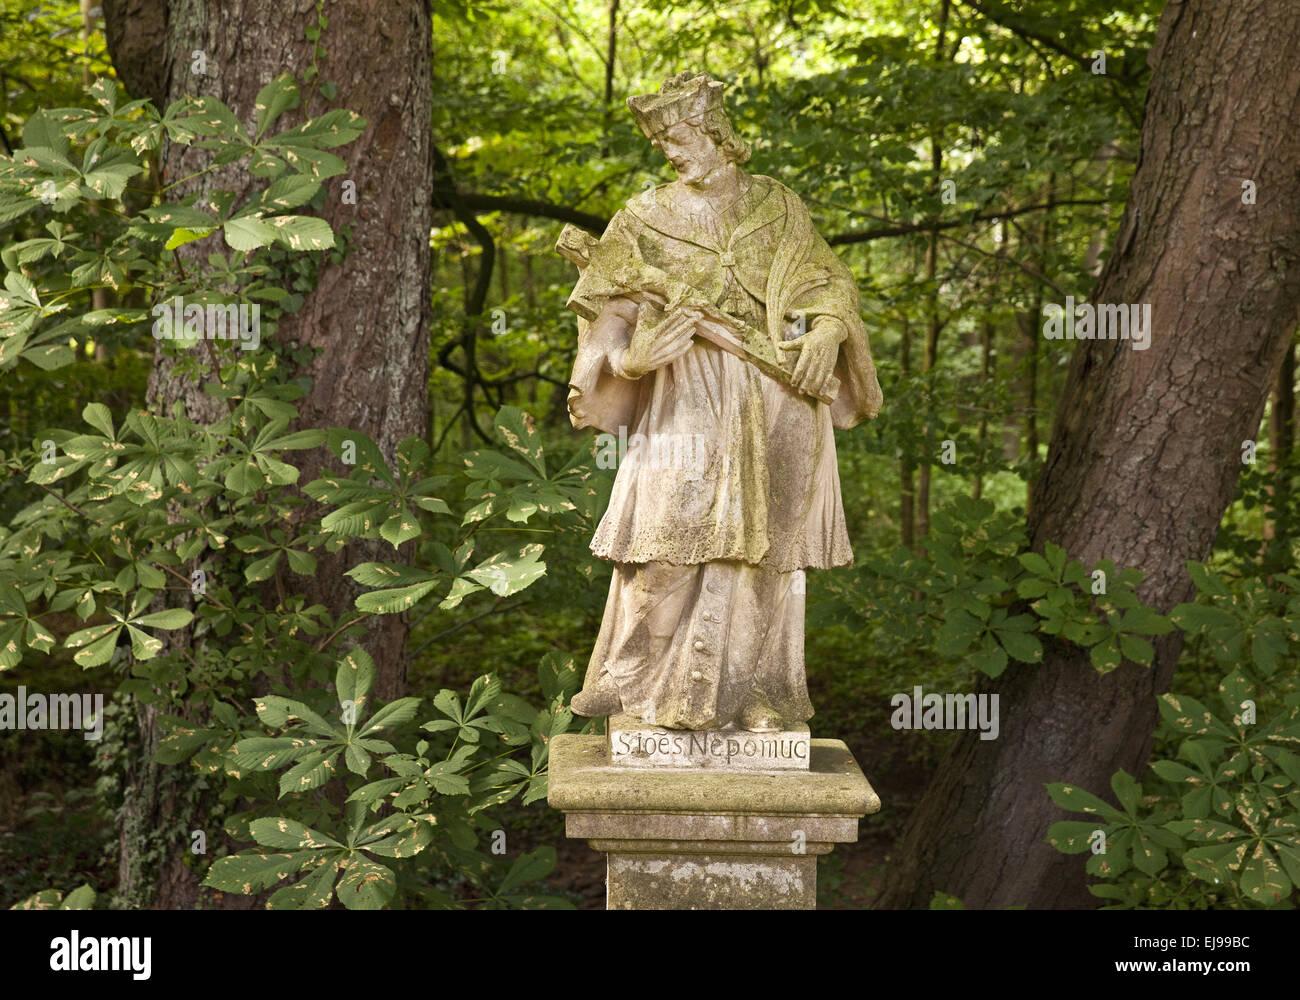 Religious statue, Ochtrup, Germany - Stock Image